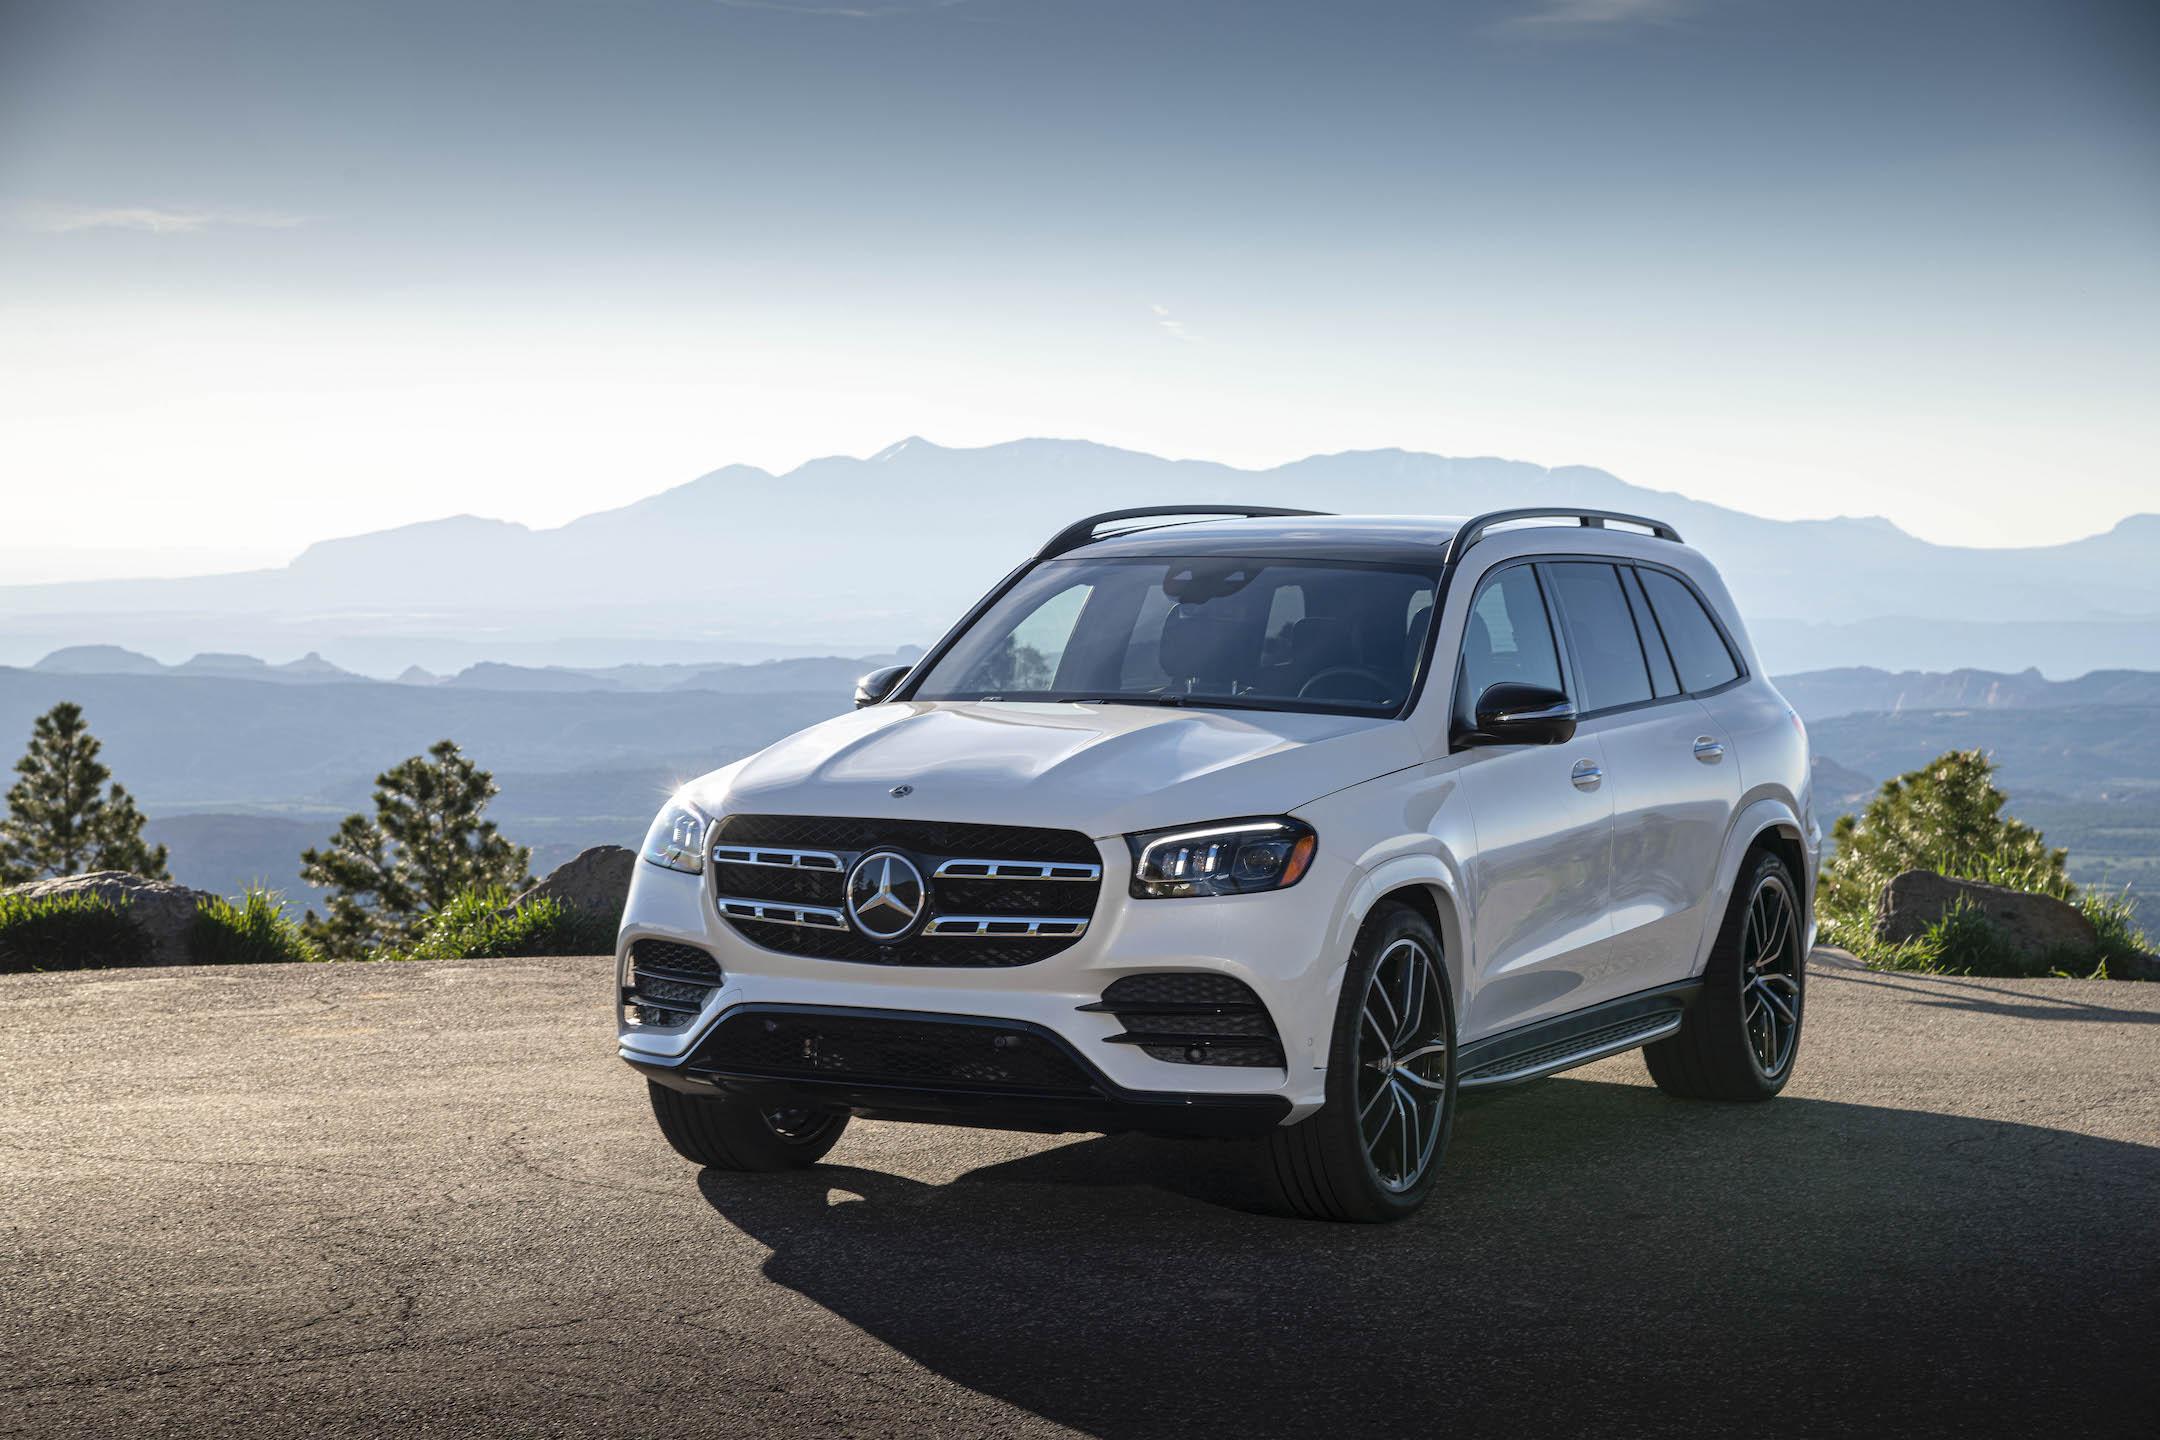 Der neue Mercedes-Benz GLS Utah 2019 // The new Mercedes-Benz GLS Utah 2019